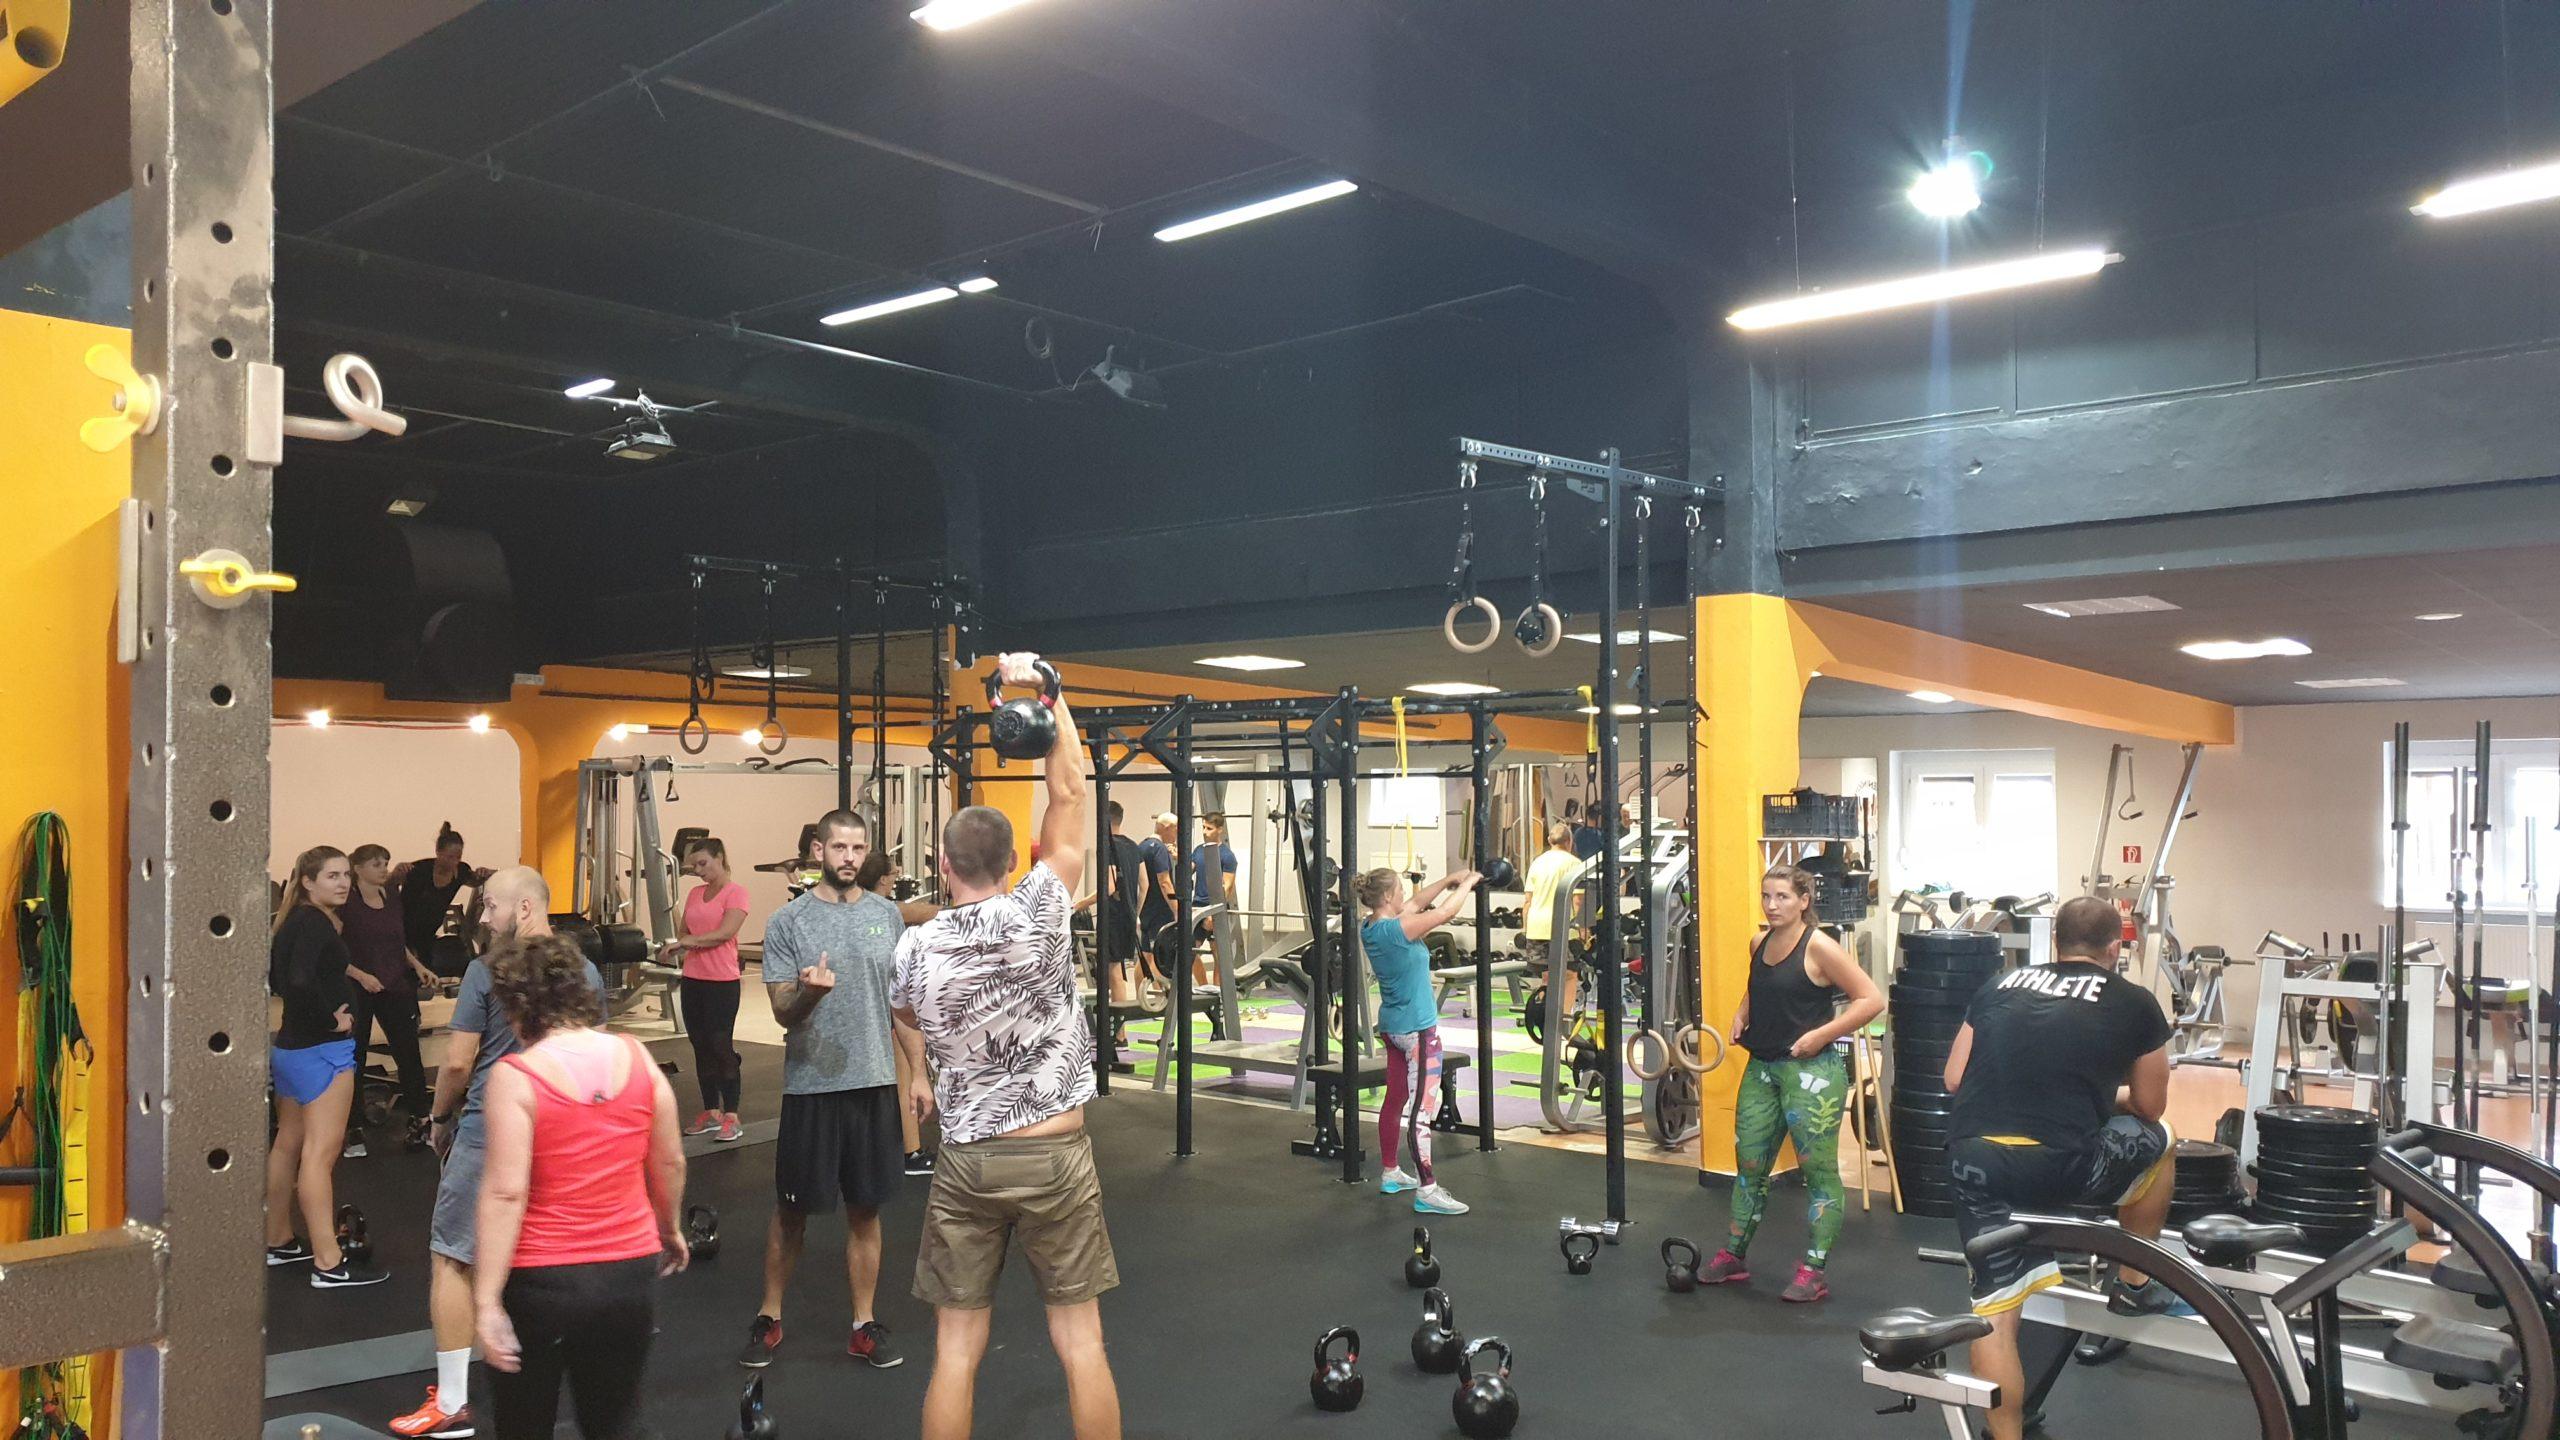 Skupinovka Funkčný tréning 26.8.19 – tréner Ivan Sivák ml.